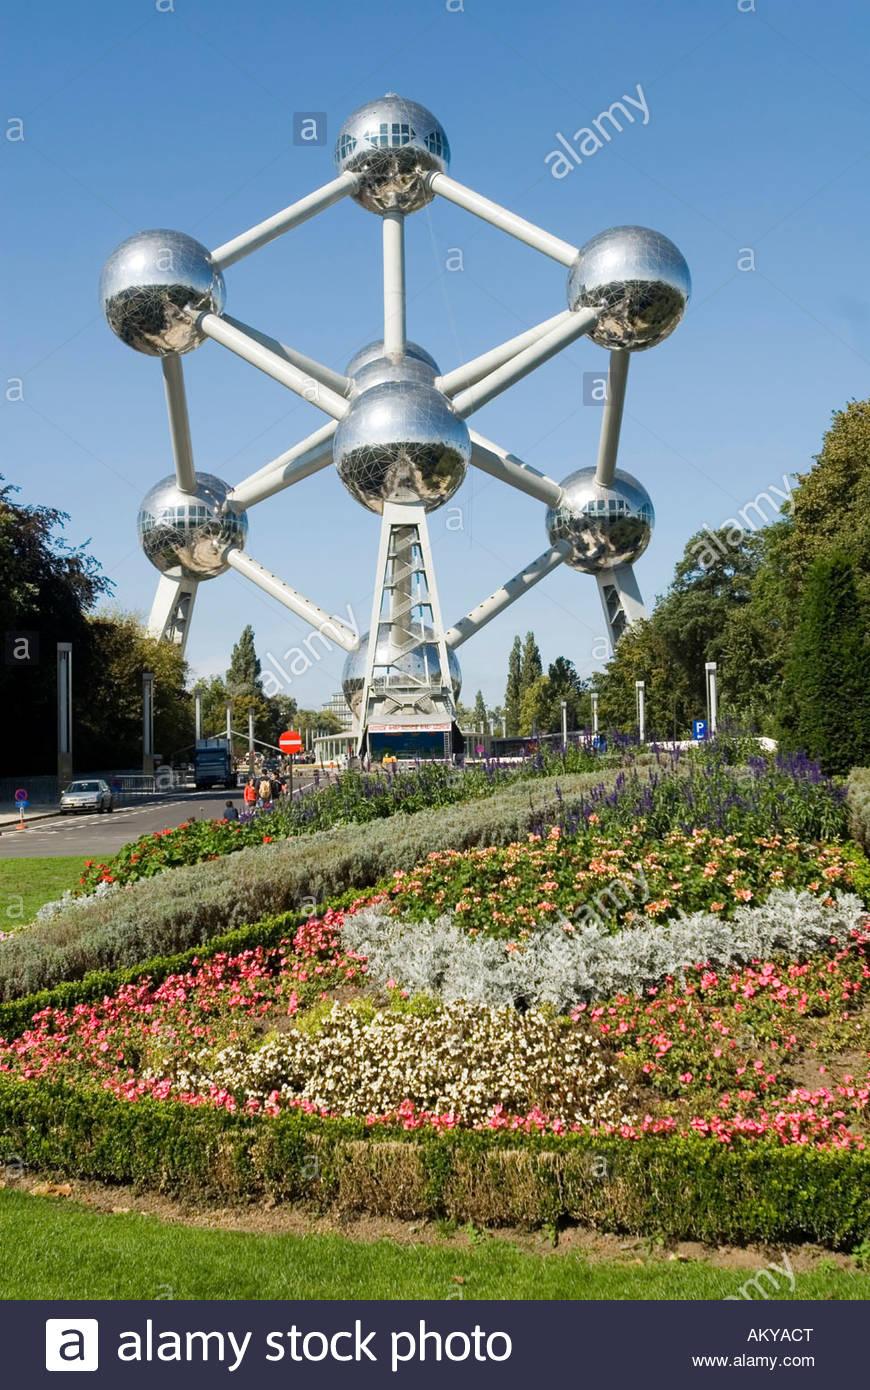 Atomium Brussels Belgium Worldfamous Monument of a iron atomic nucleus - Stock Image